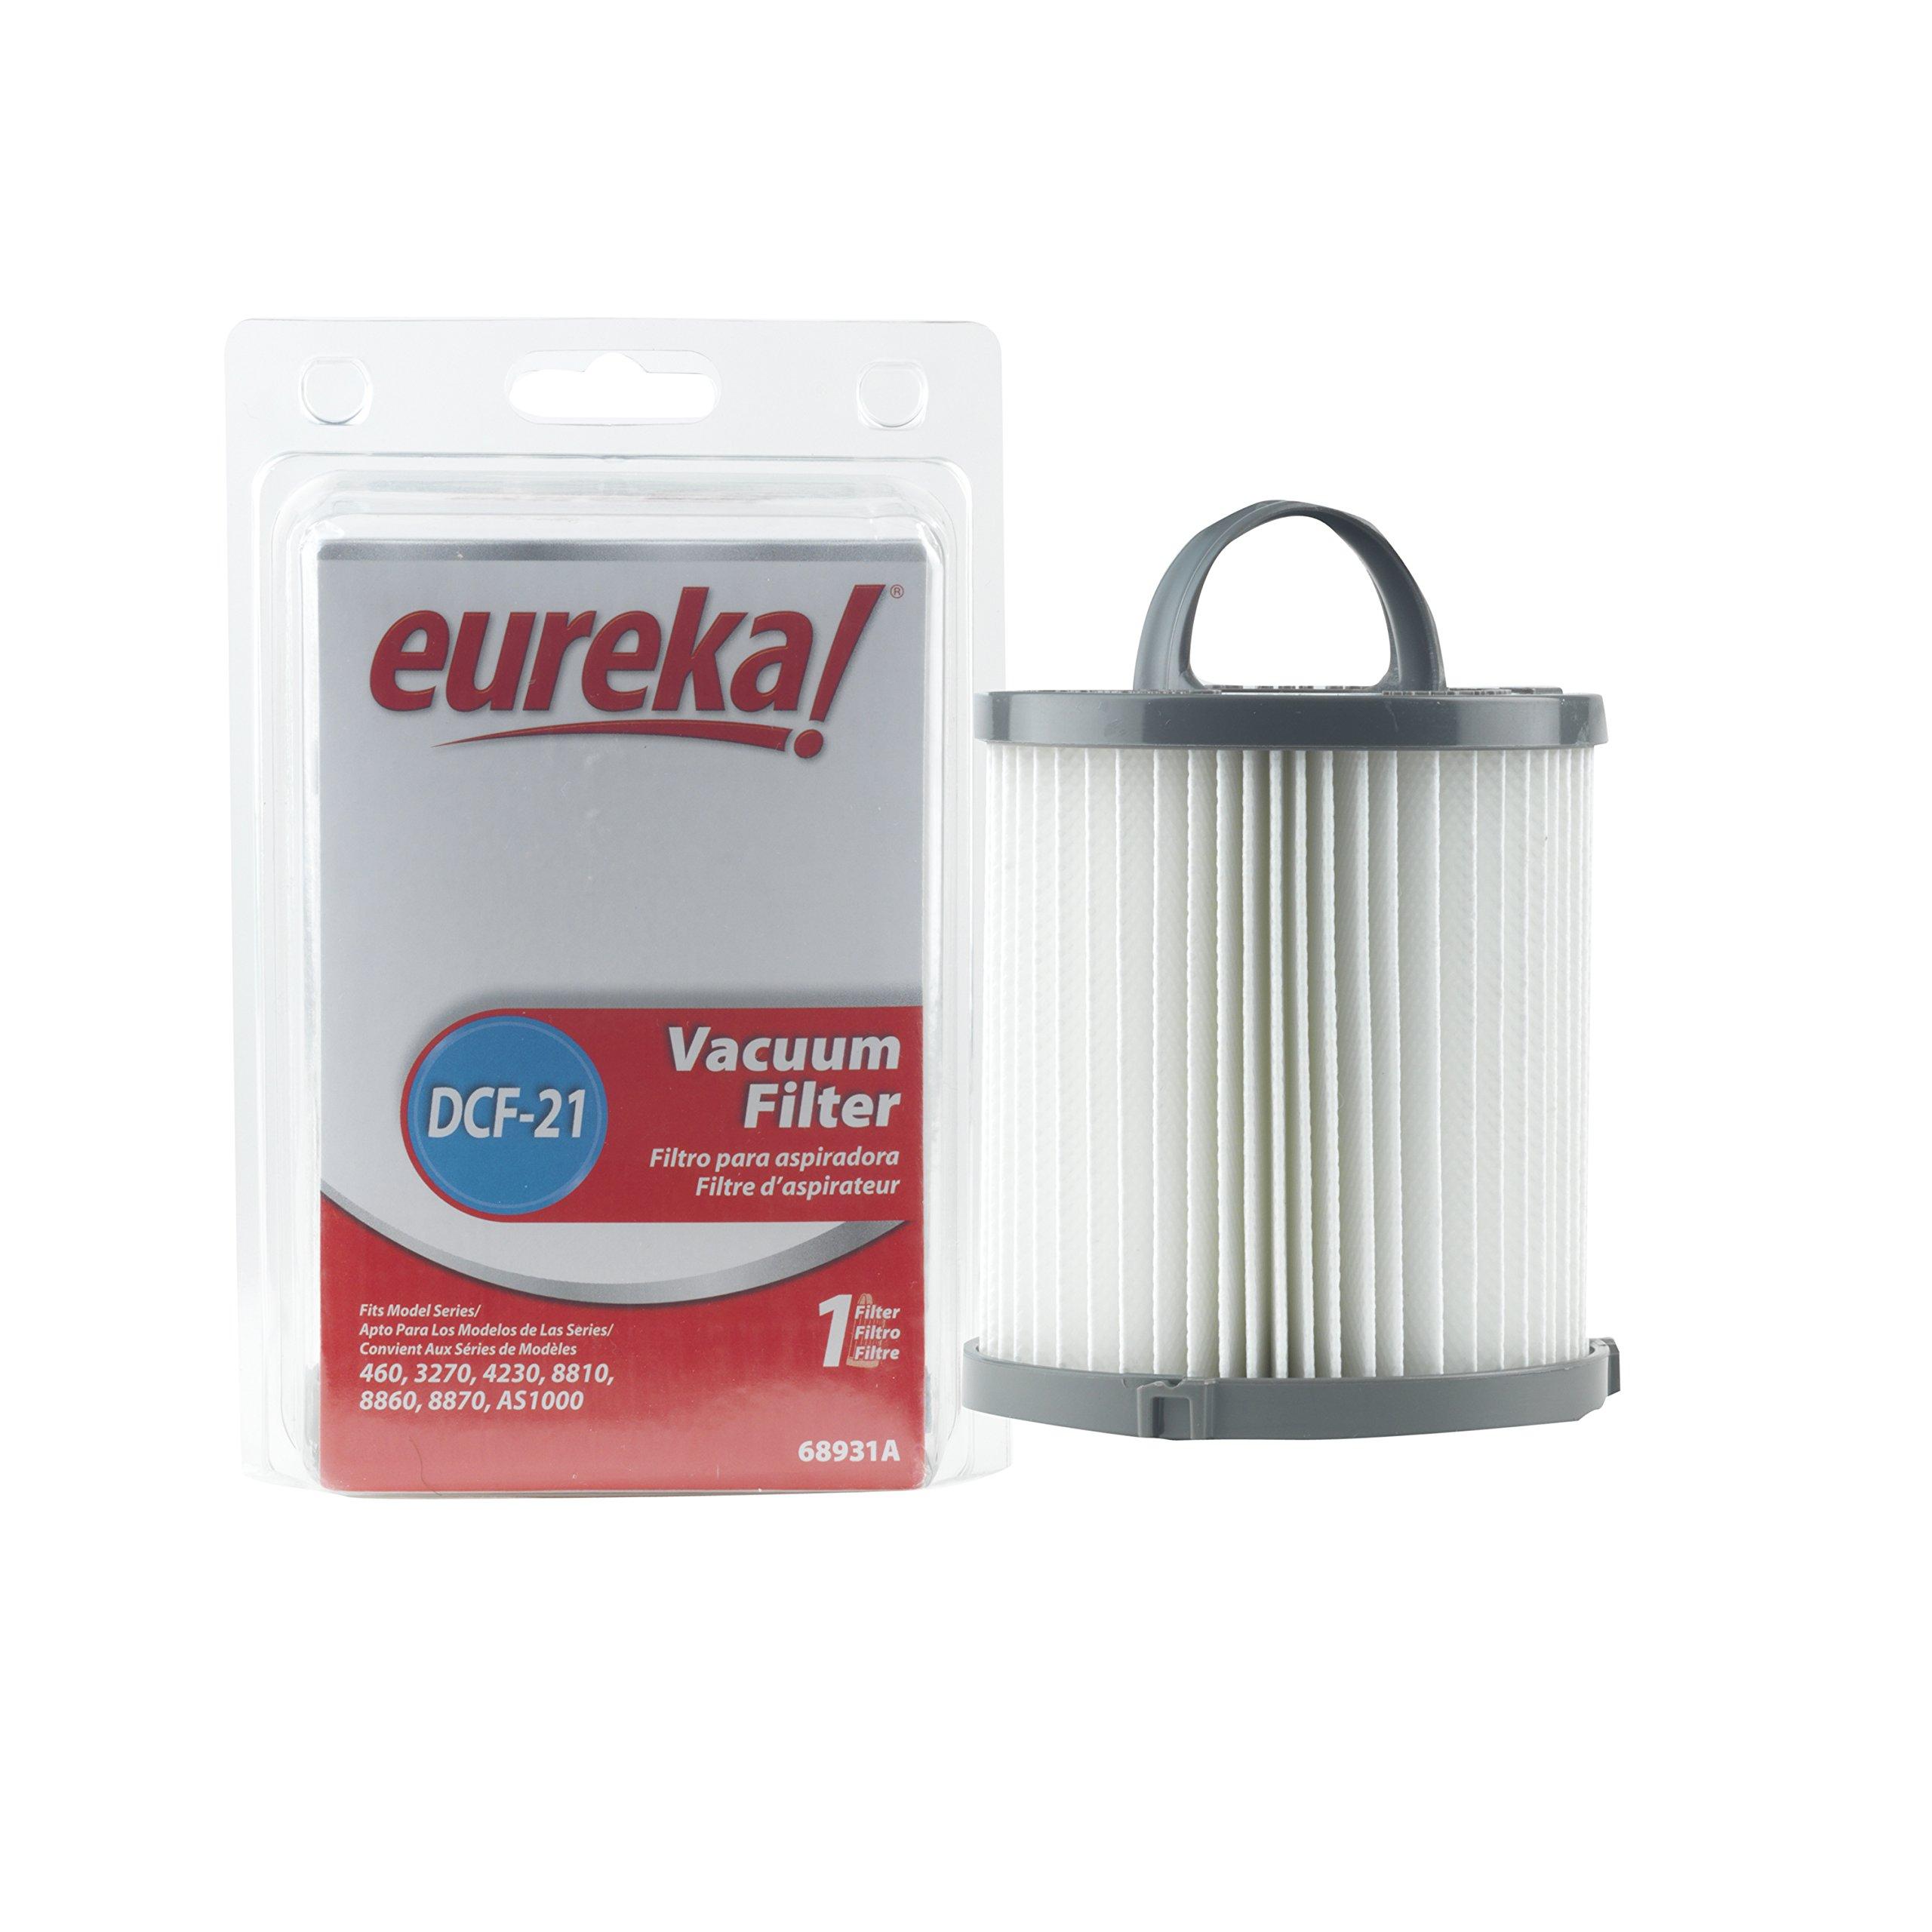 Genuine Eureka DCF-21 Filter 68931 - 1 filter